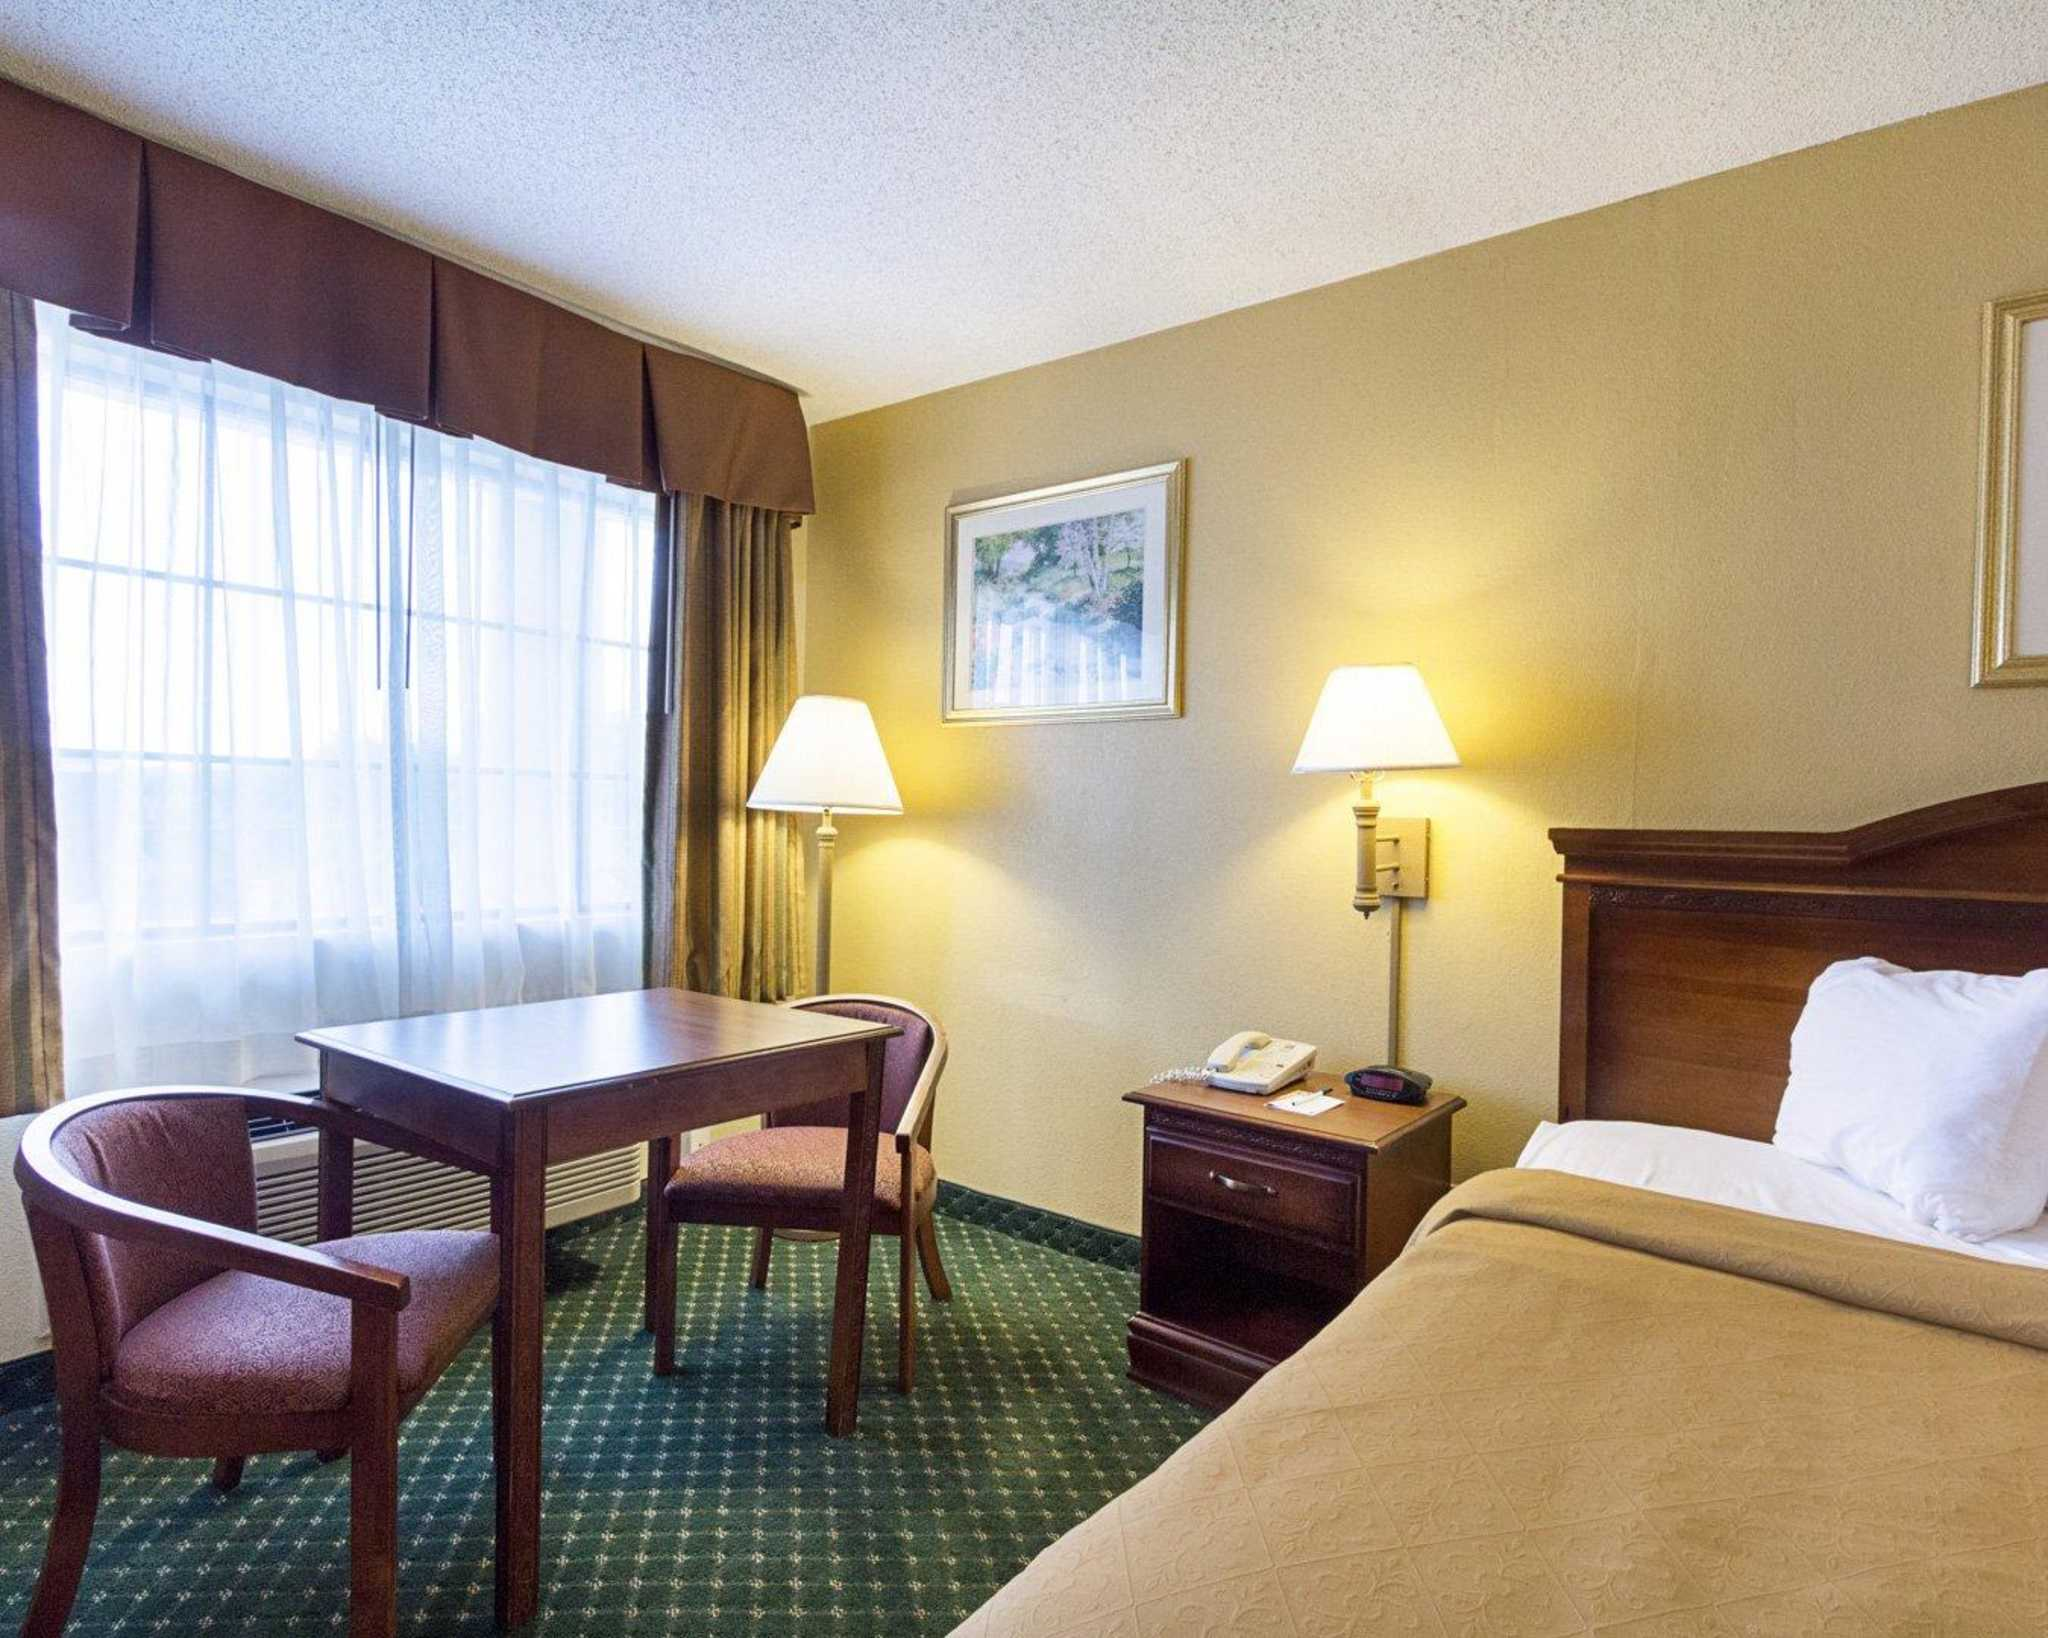 Quality Inn & Suites Southwest image 15